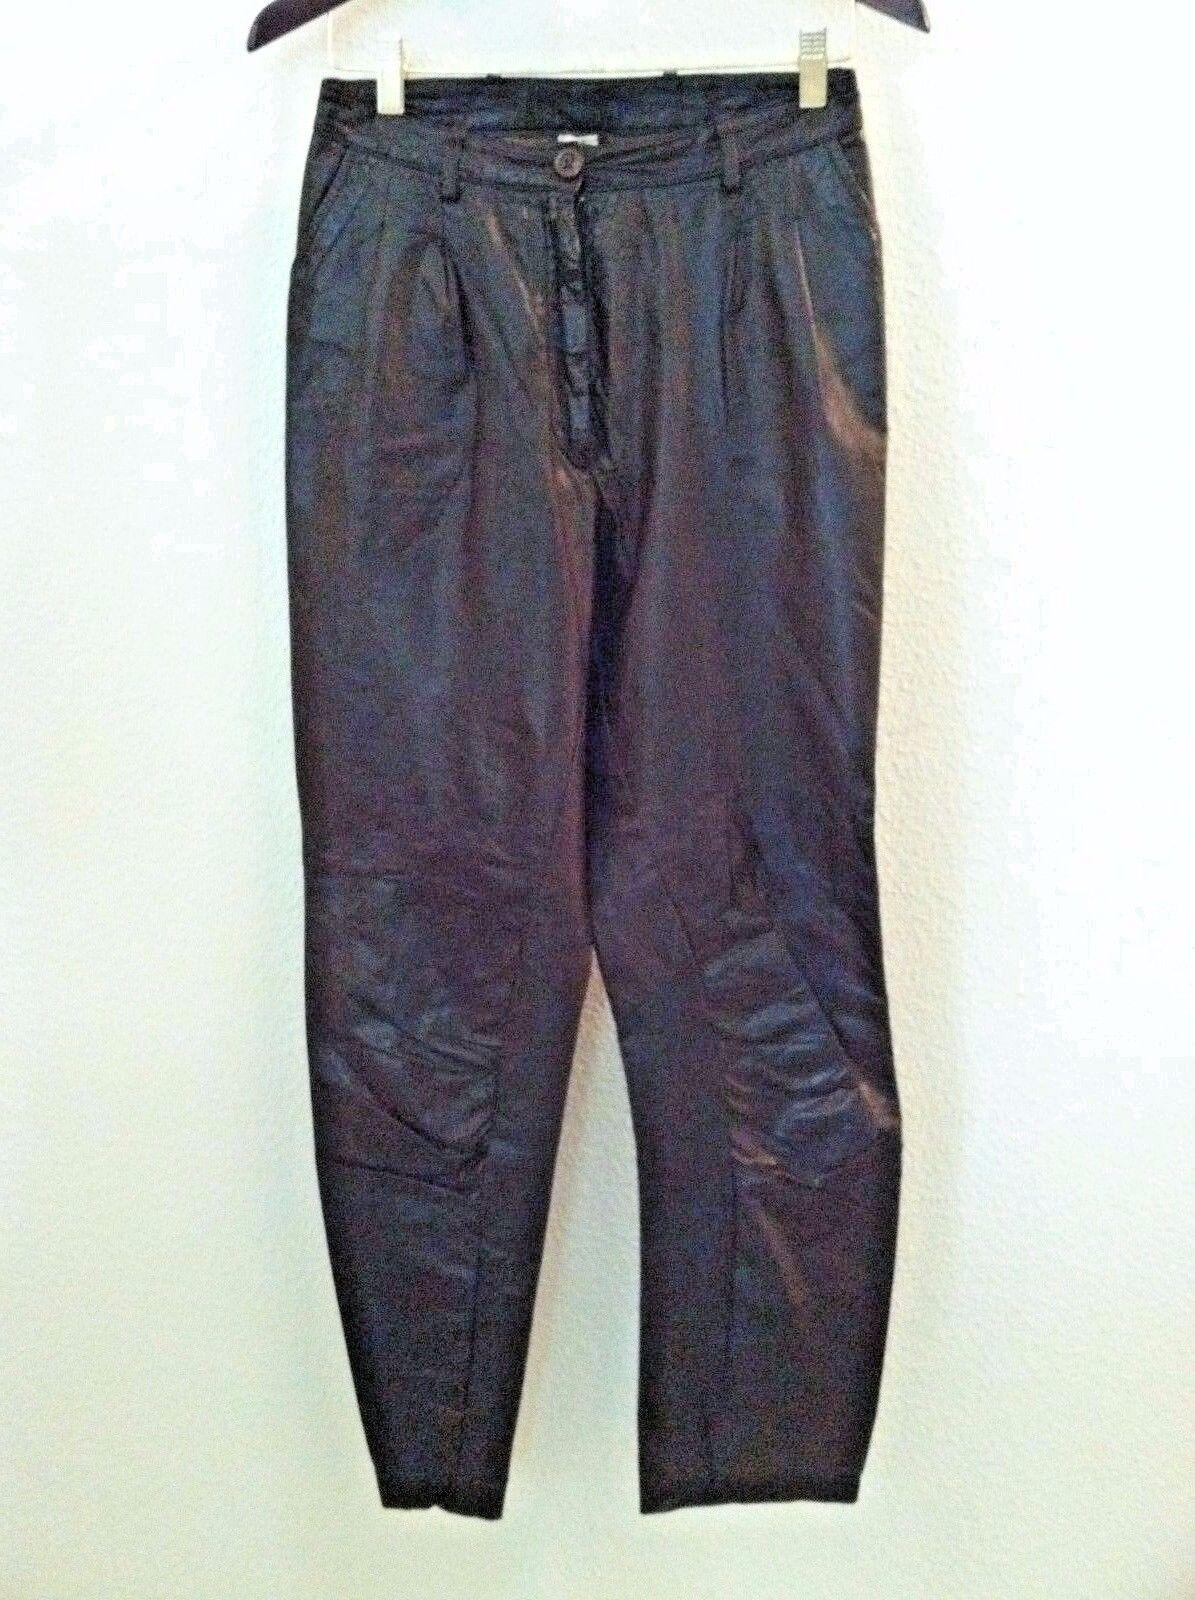 Vintage damen pants braun leather trouser baggies pleated Größe 4 6